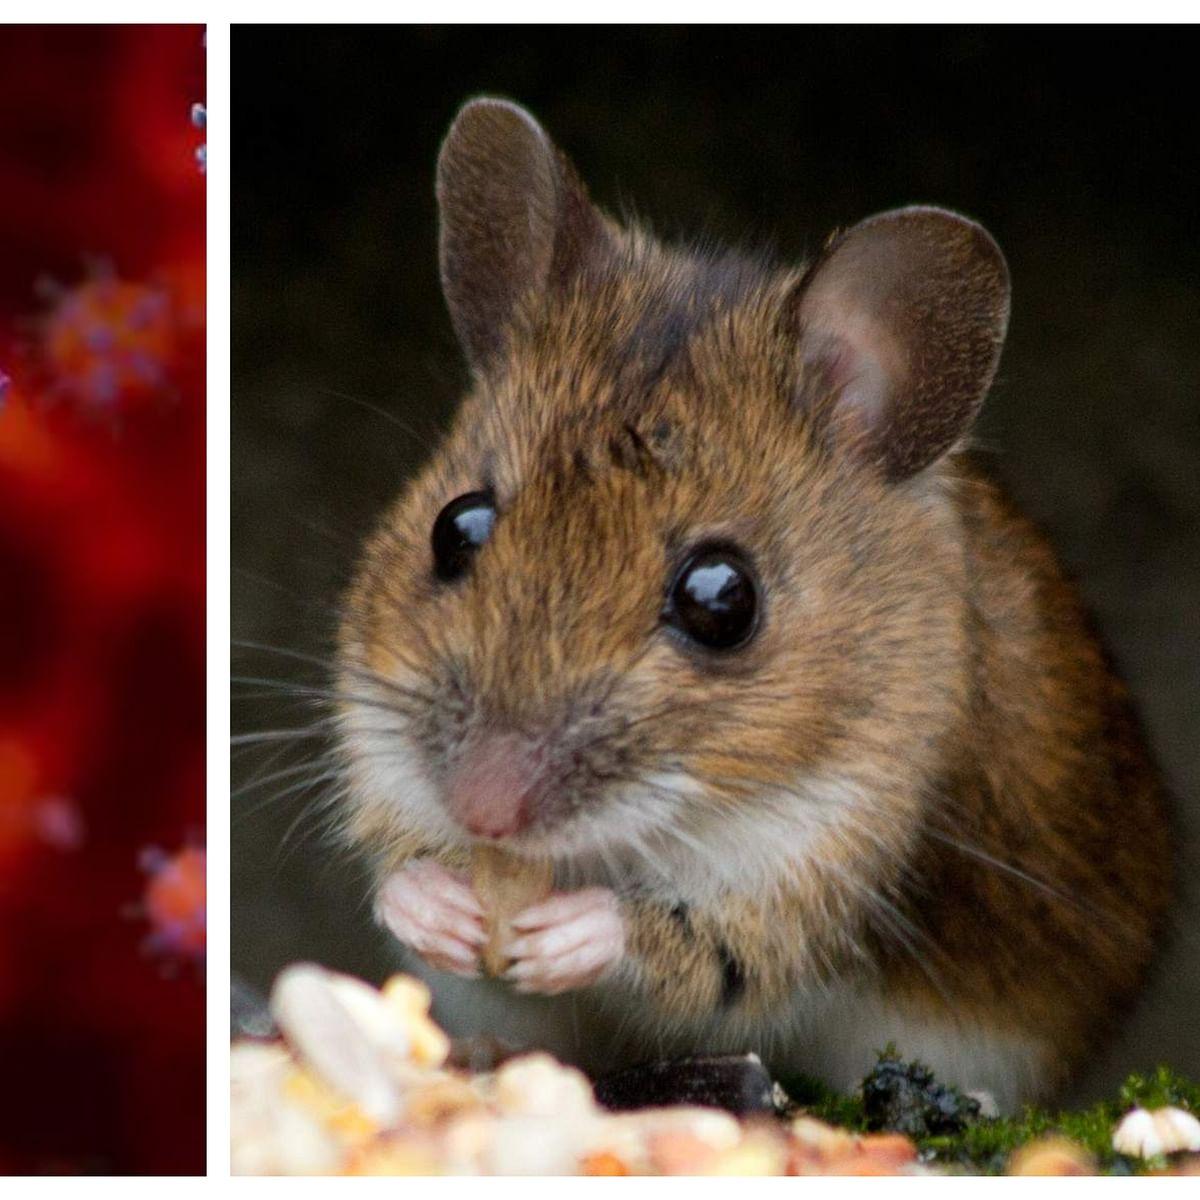 Potential vaccine for COVID-19 generates immunity in mice: Study